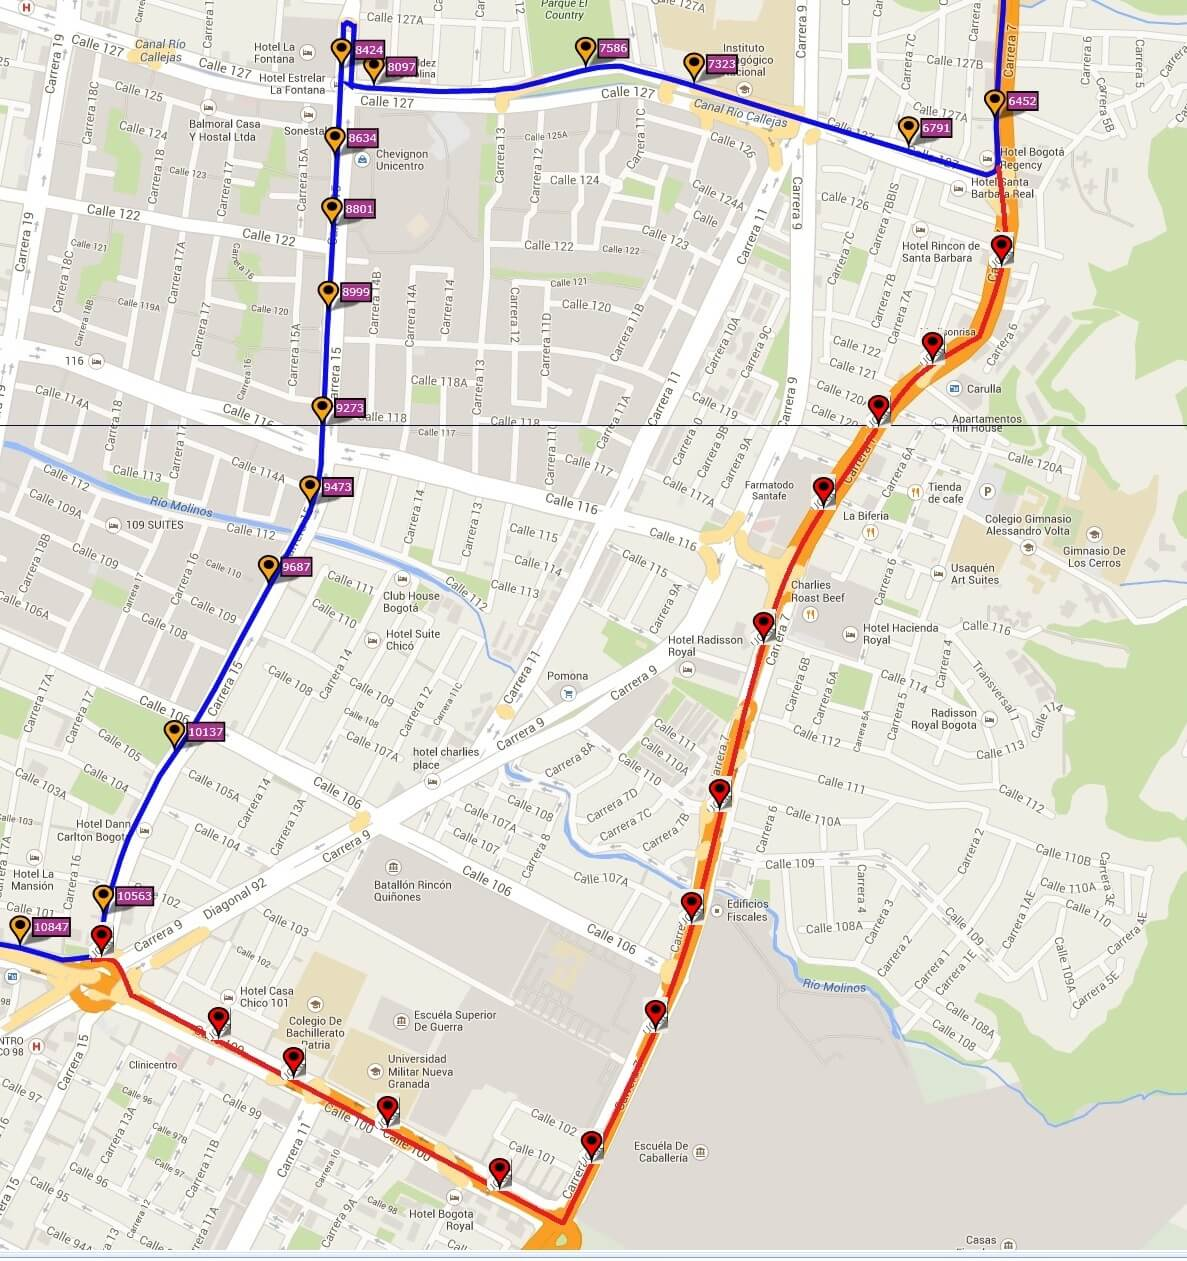 Ruta SITP: Z4 Toberín ↔ Metrovivienda [Urbana] 5